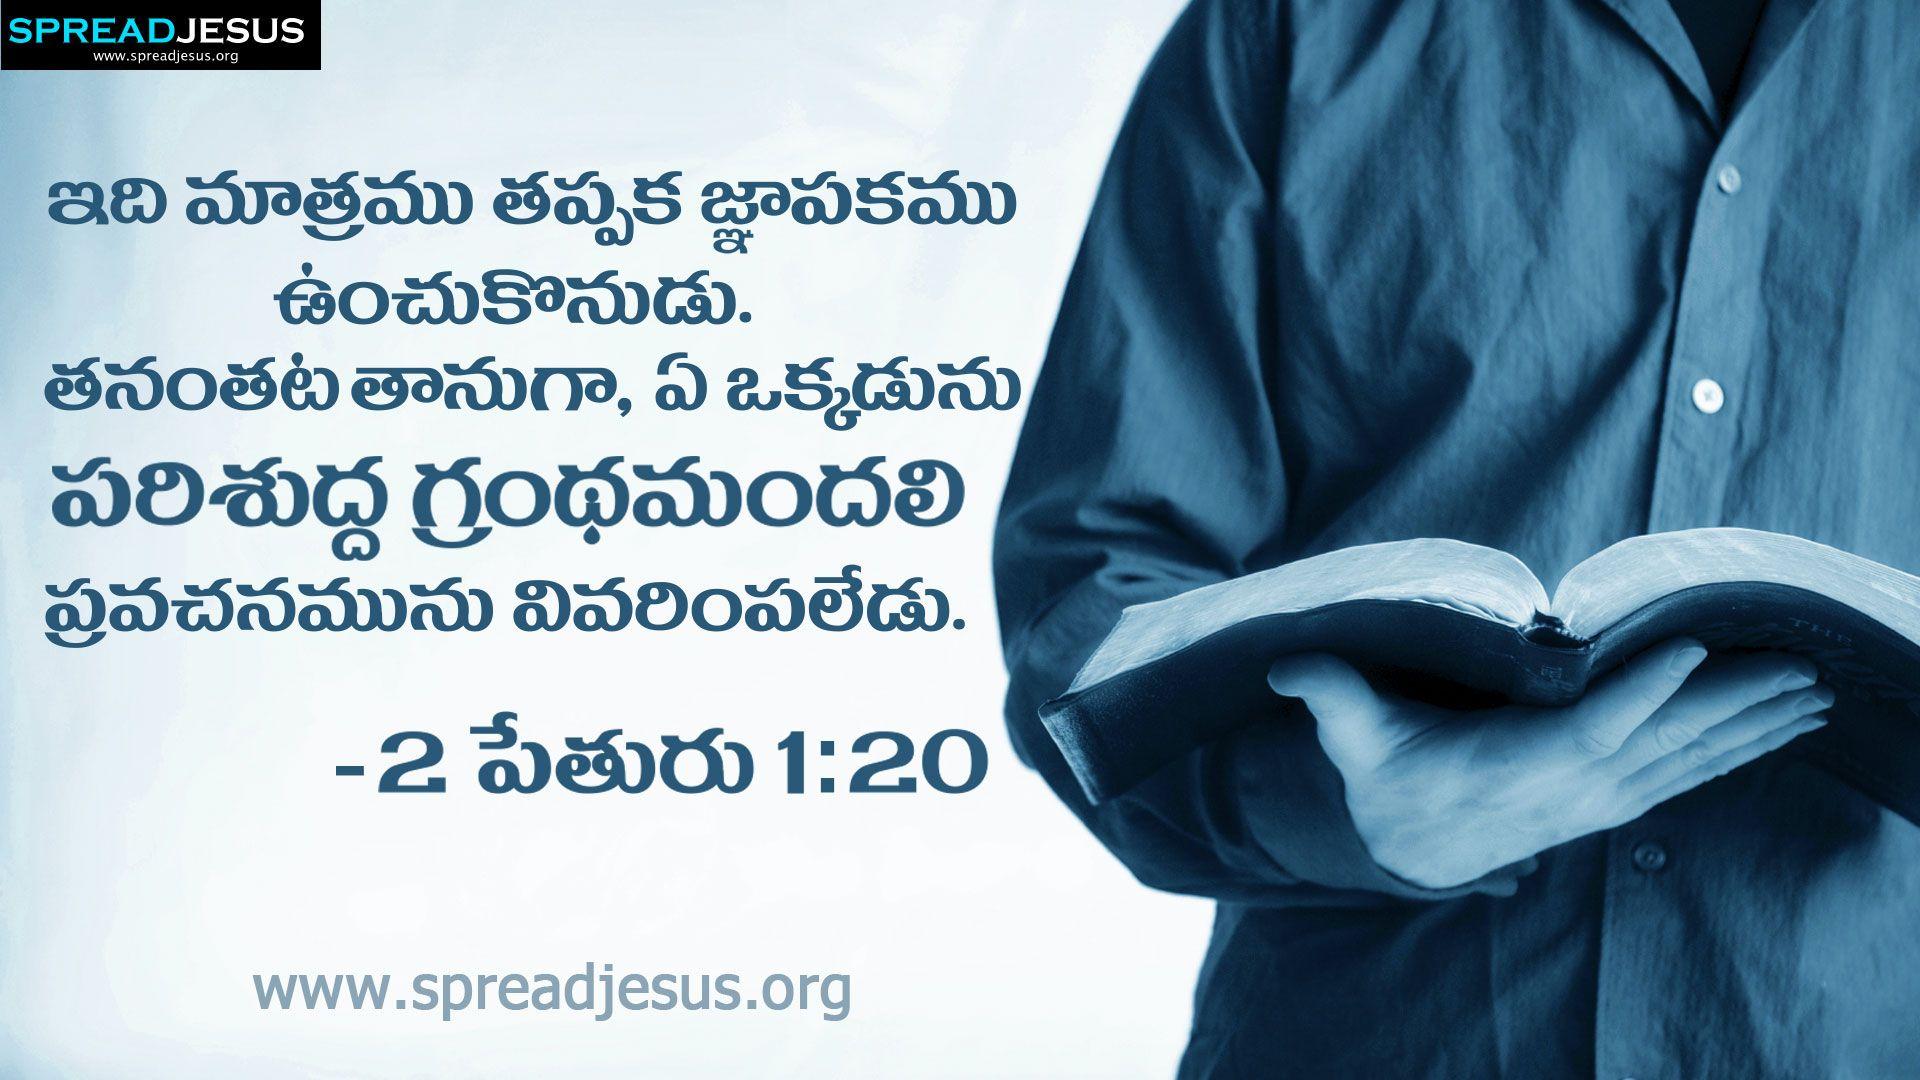 Telugu Bible Quotes Hd Wallpapers 2 Pethuru 1 20 Bible Quotes Hd Bible Quotes Bible Quotes Telugu